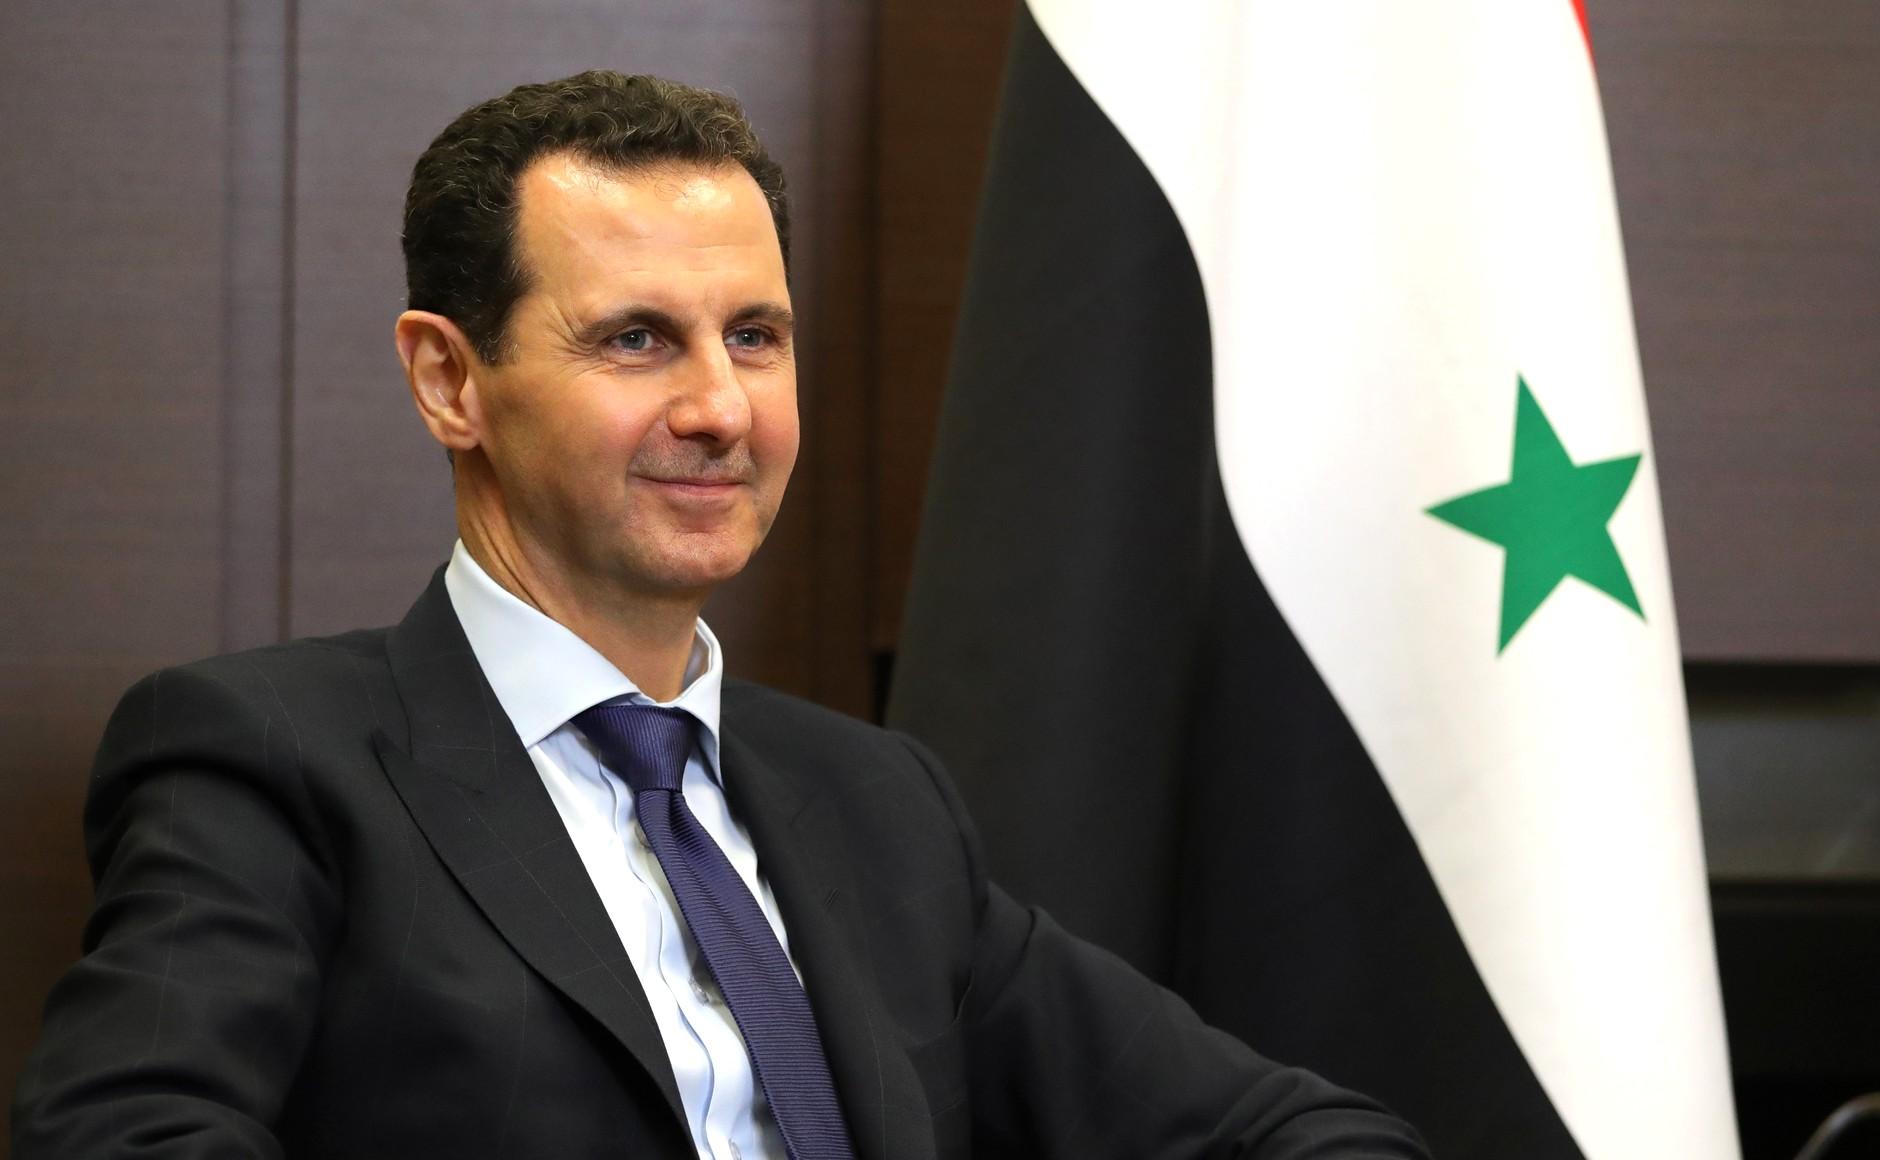 Syrian Dictator Bashar al-Assad Calls Trump 'The Best American President': 'A Transparent Foe'